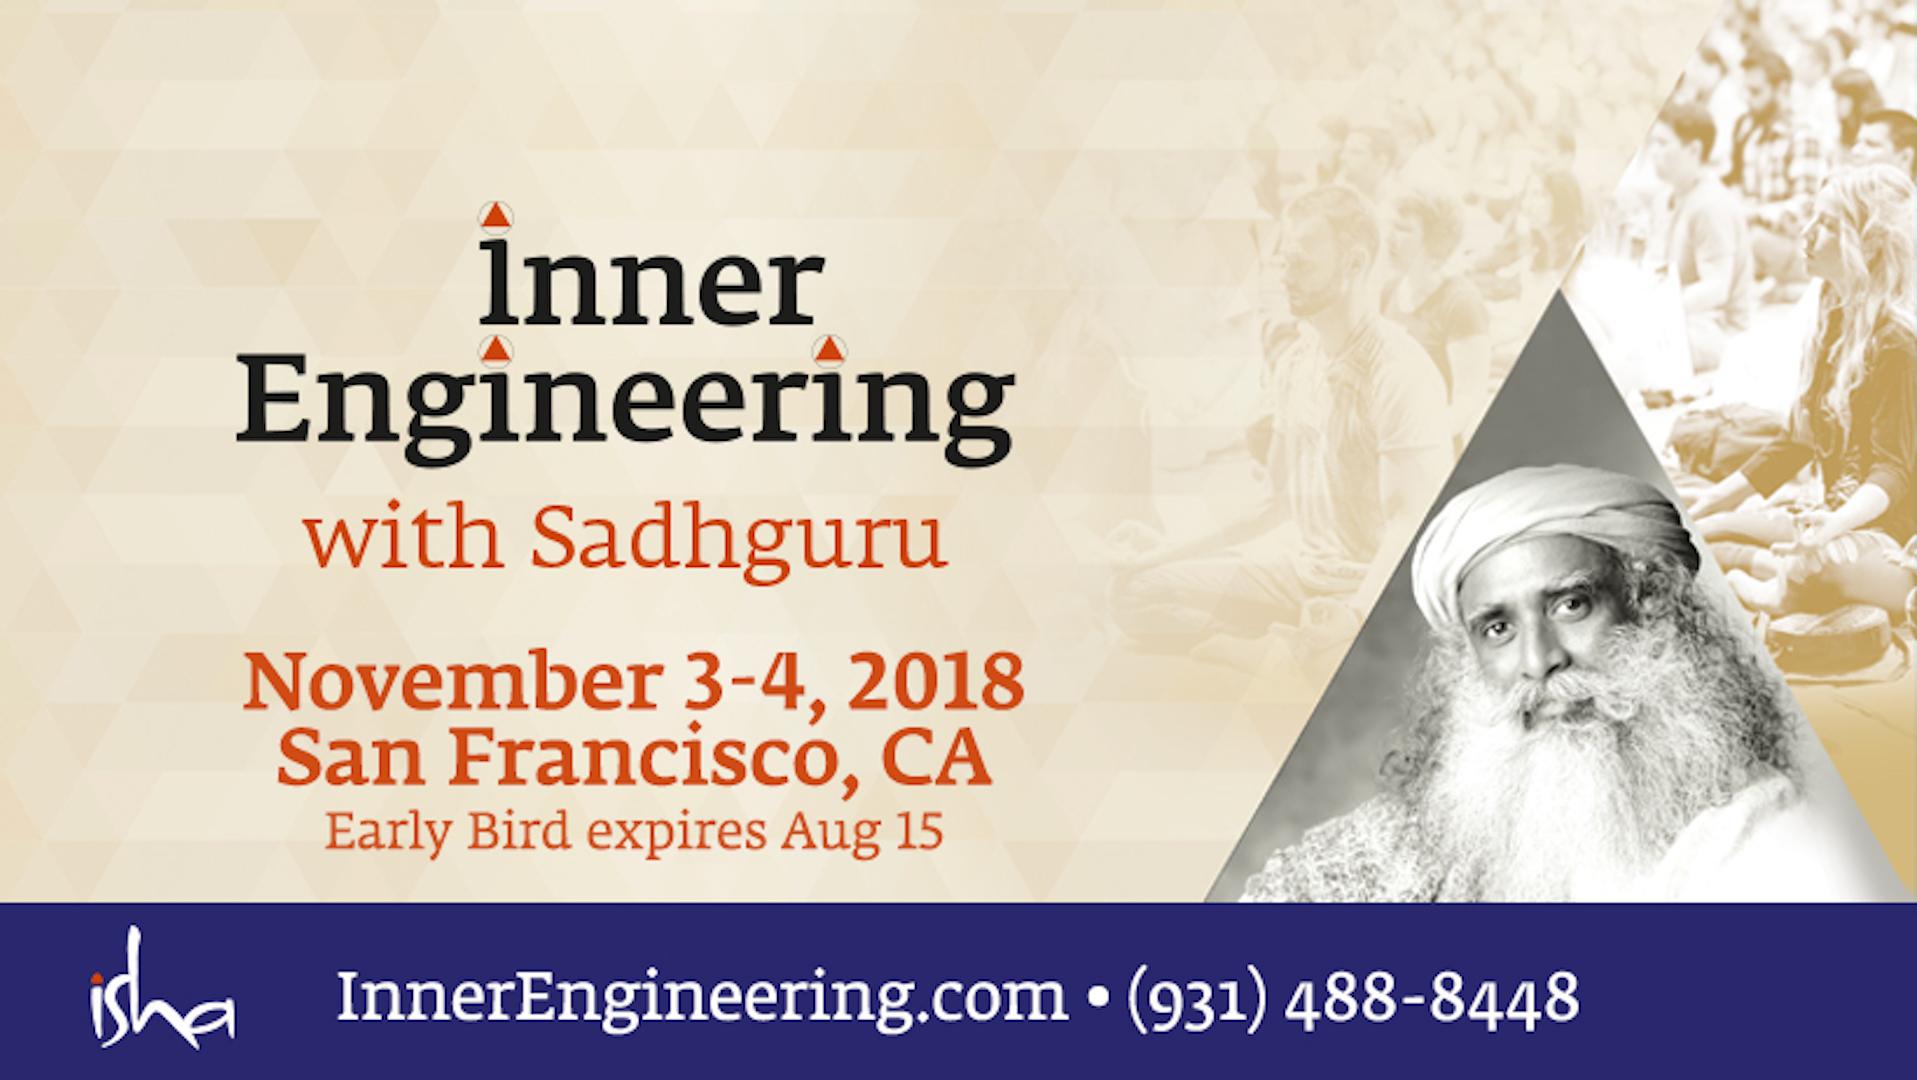 Inner Engineering with Sadhguru